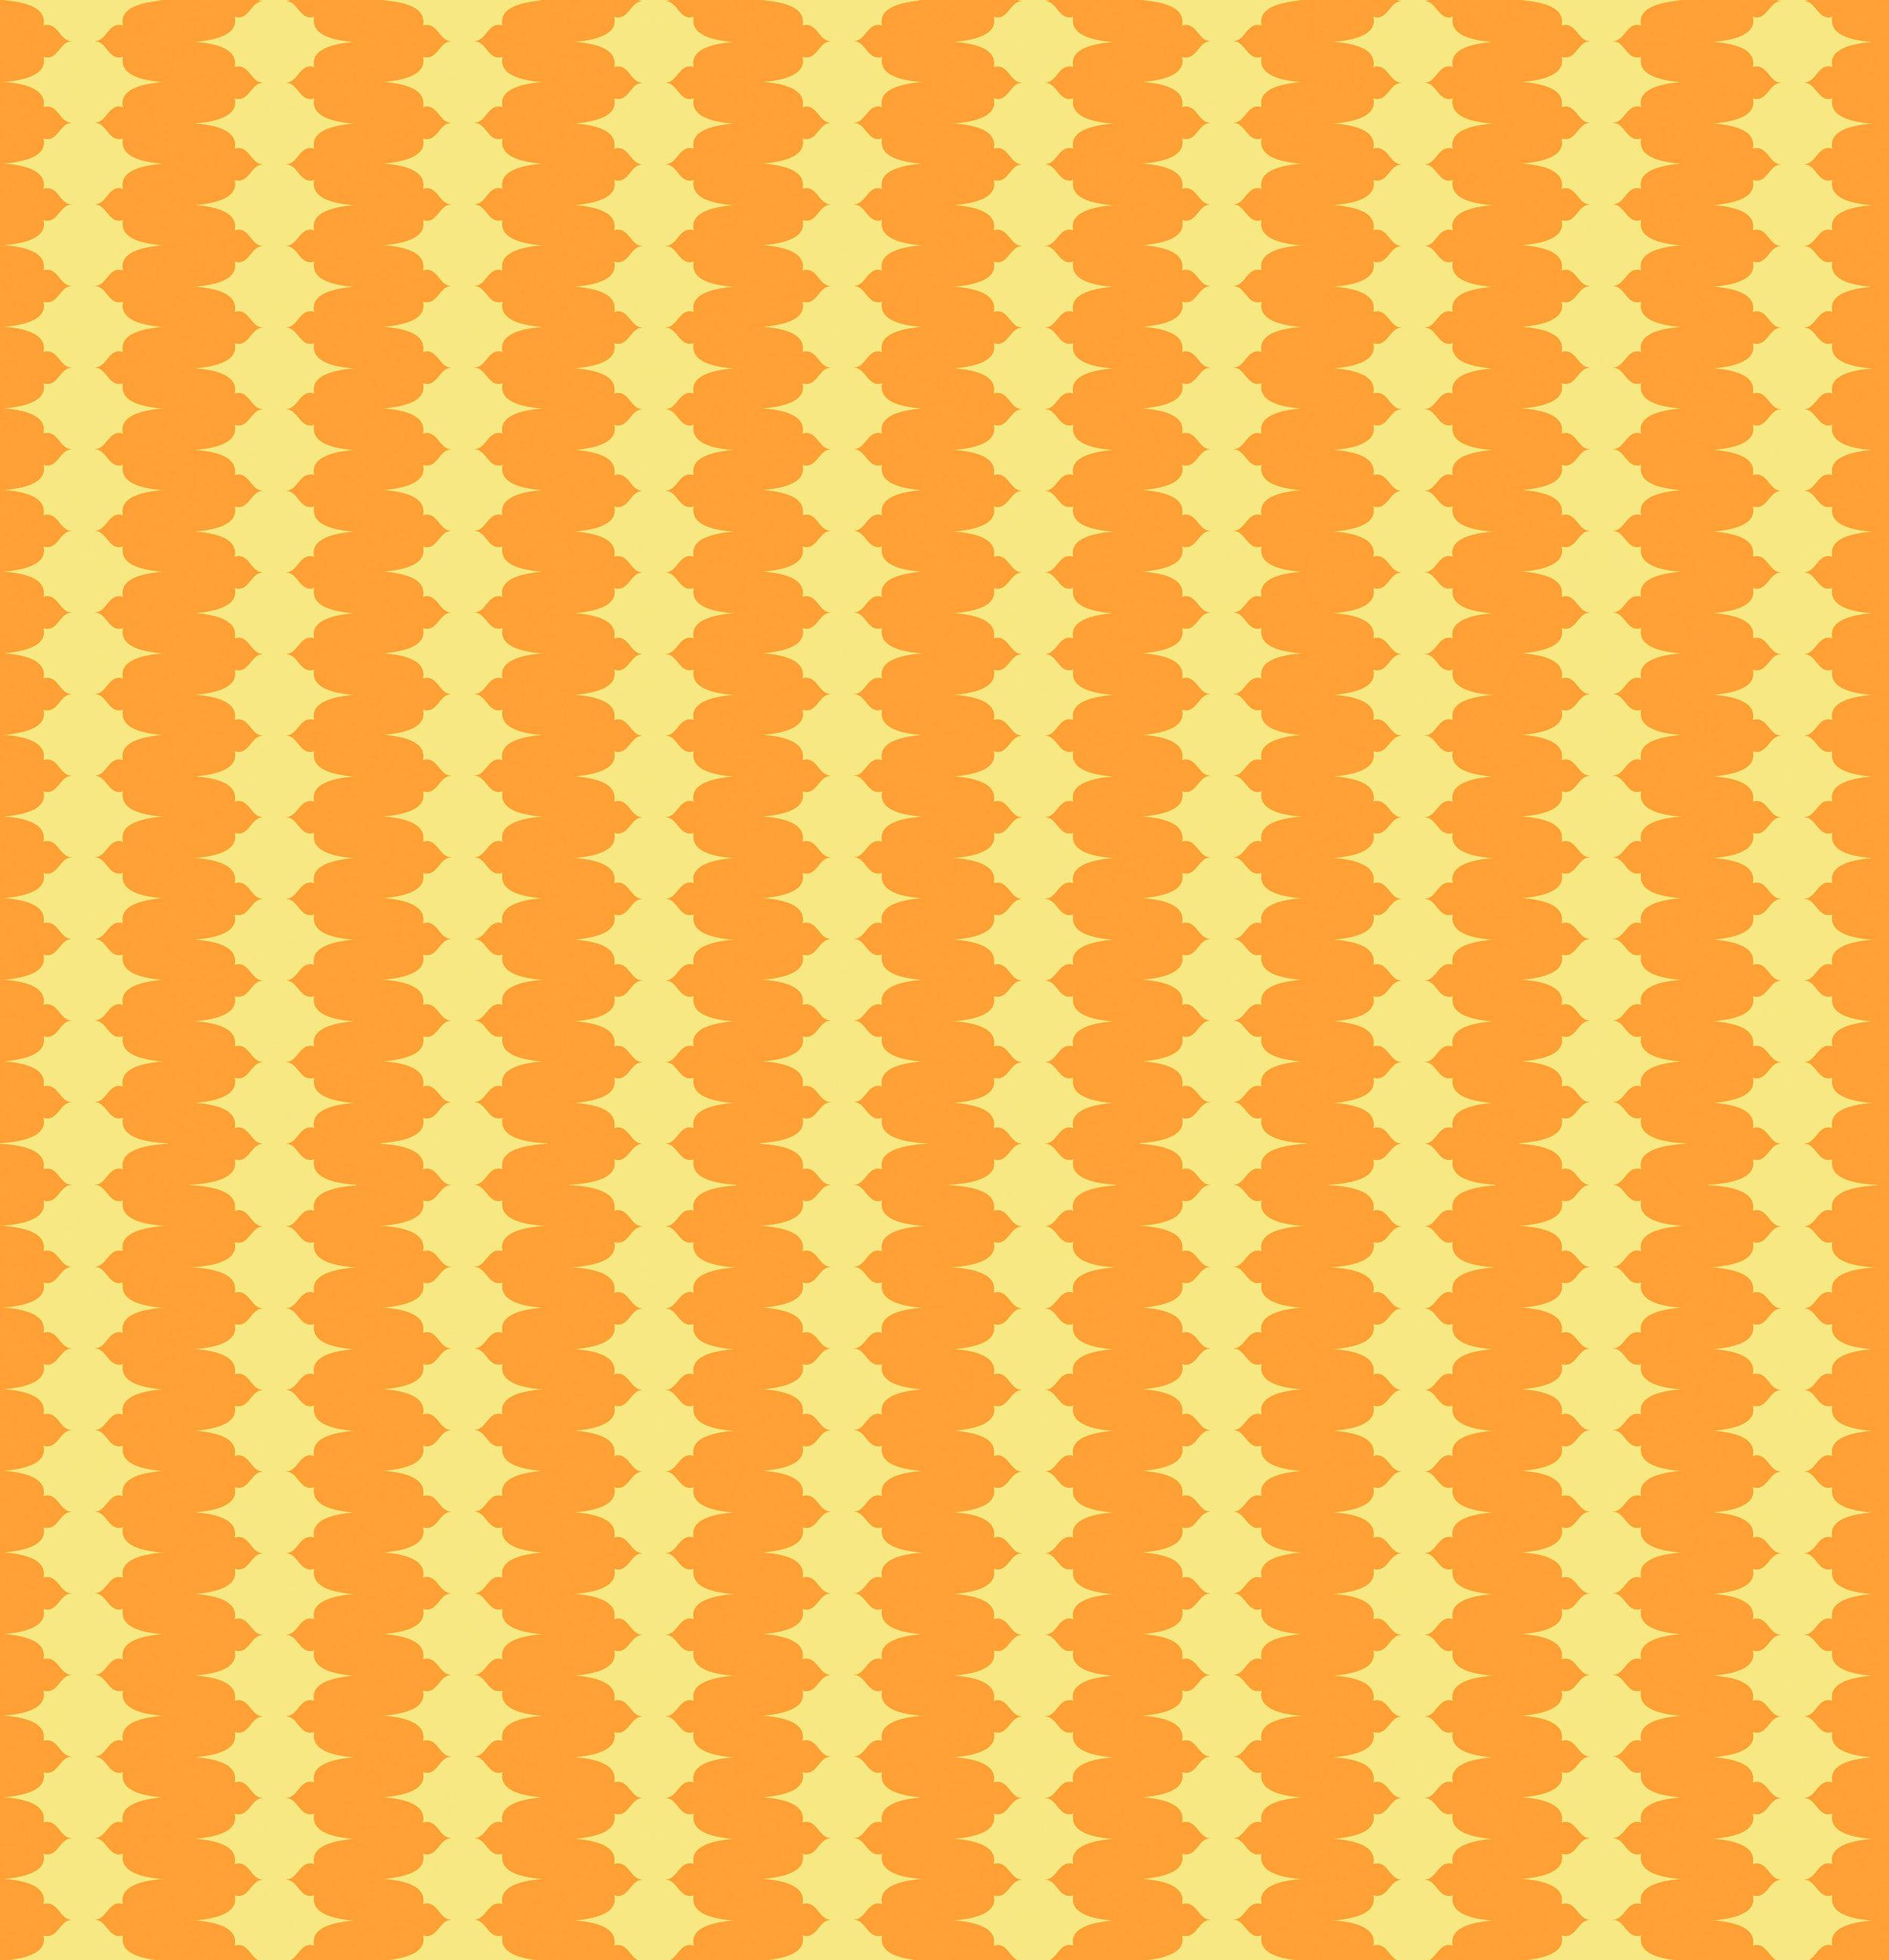 stripe orange and yellow-01.jpg